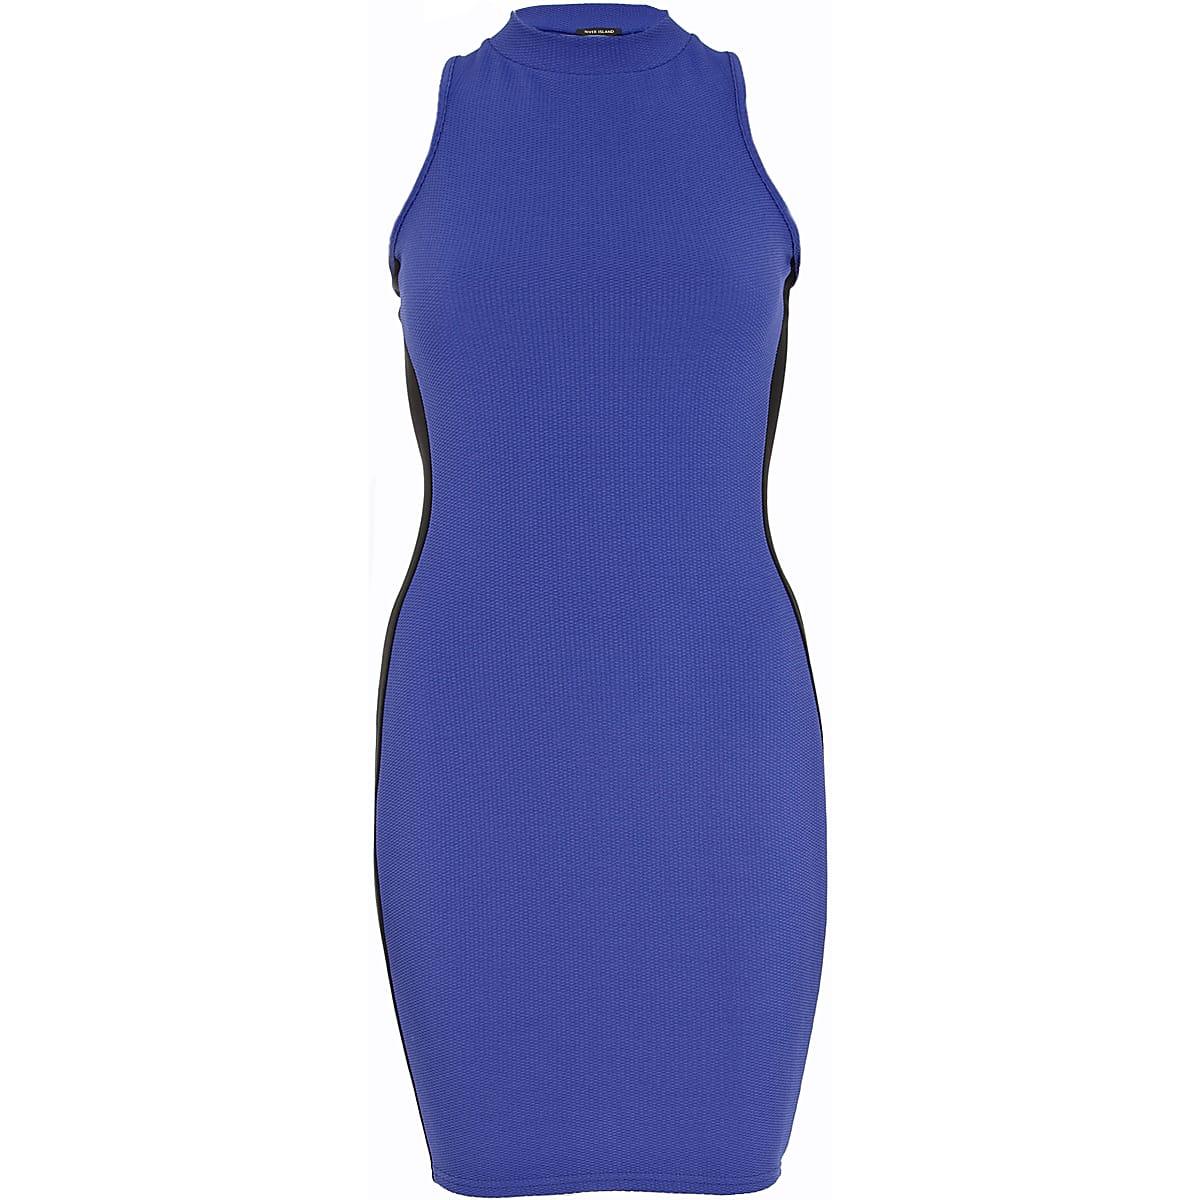 Blue textured turtle neck bodycon dress